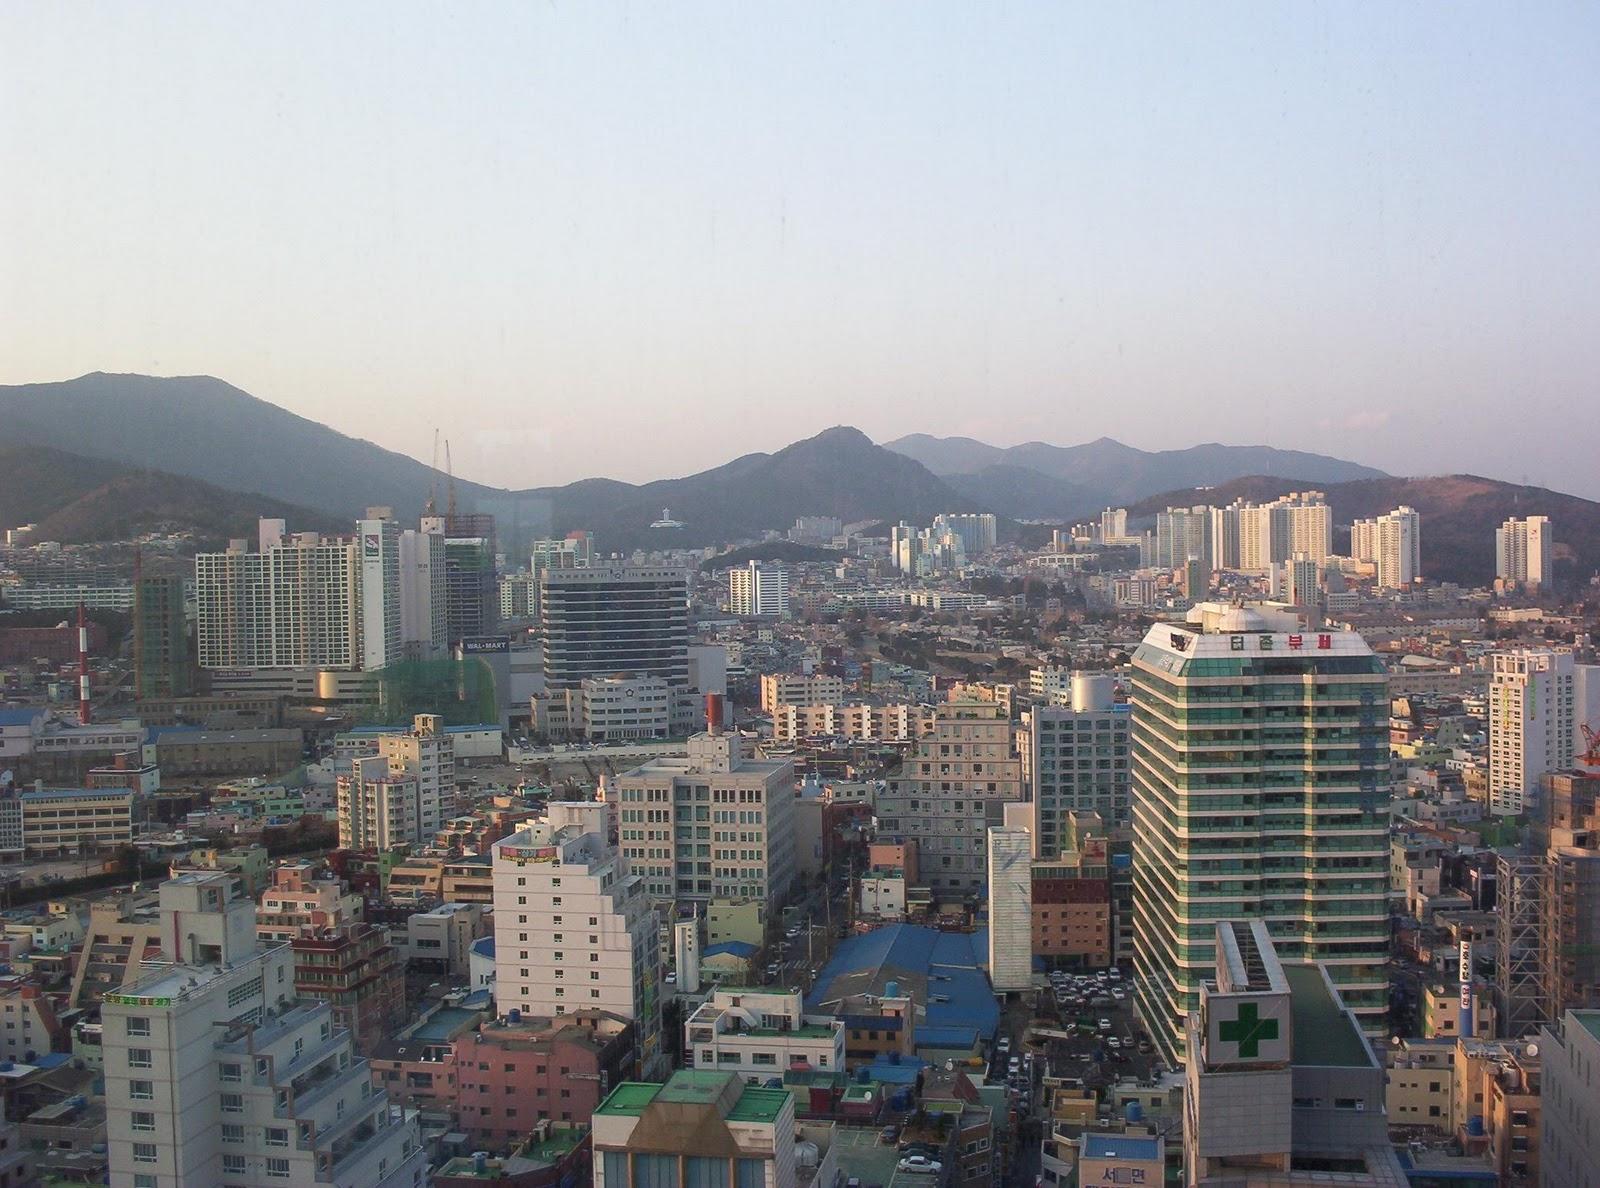 http://1.bp.blogspot.com/_e45GK4i1E8M/TRjbxEJNguI/AAAAAAAACrY/sFItmBPyEQg/s1600/South-Korea-Pusan.jpg